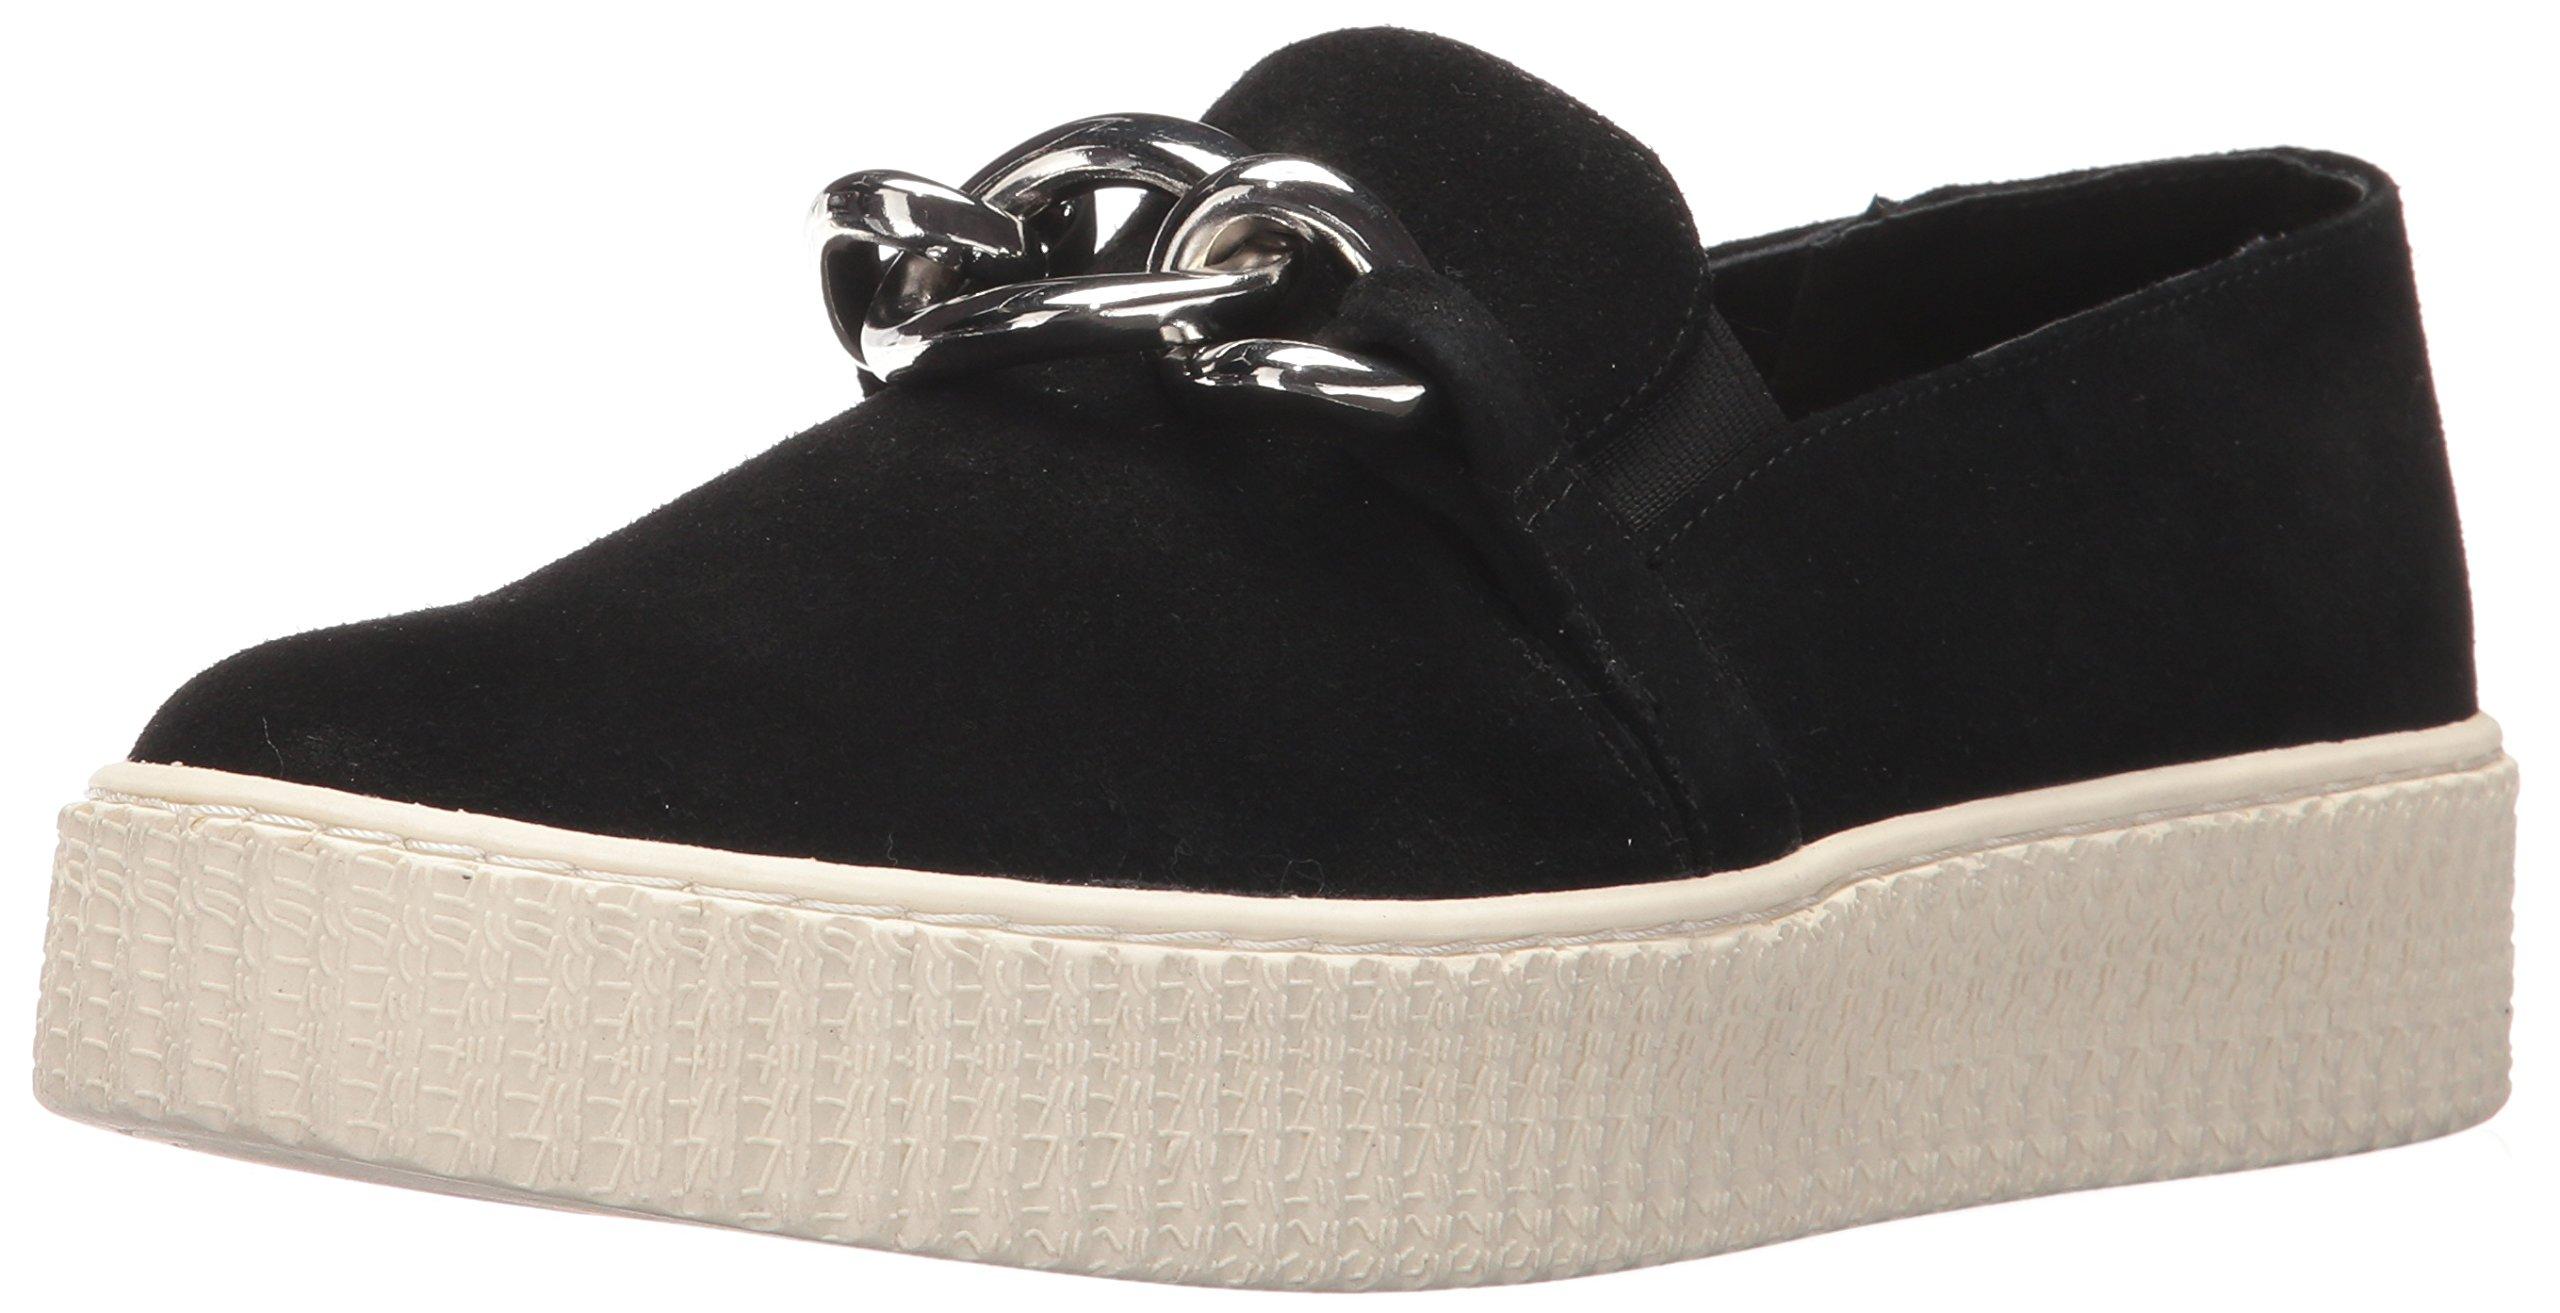 Splendid Women's Roberta Sneaker, Black, 9.5 M US